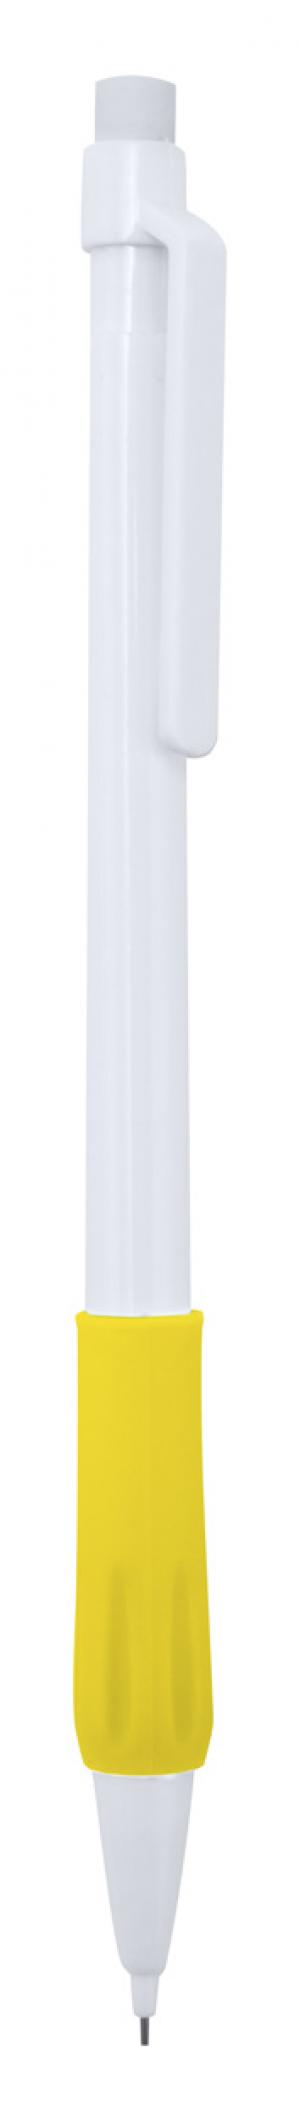 Verslo dovanos Ziron (mechanical pencil)